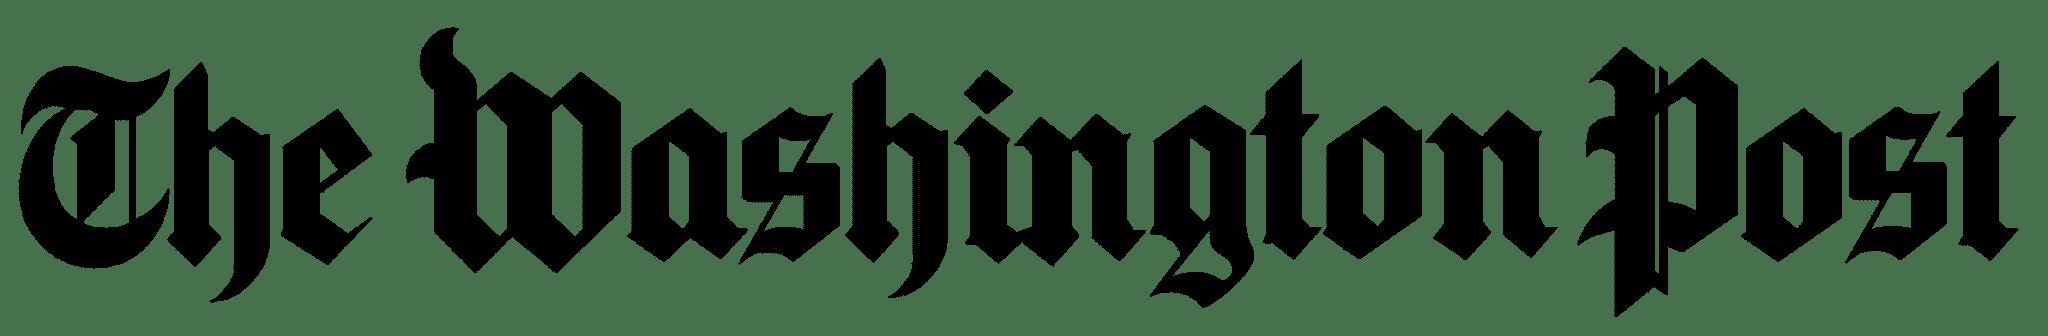 the-washington-post-logo-png-transparent-2.png